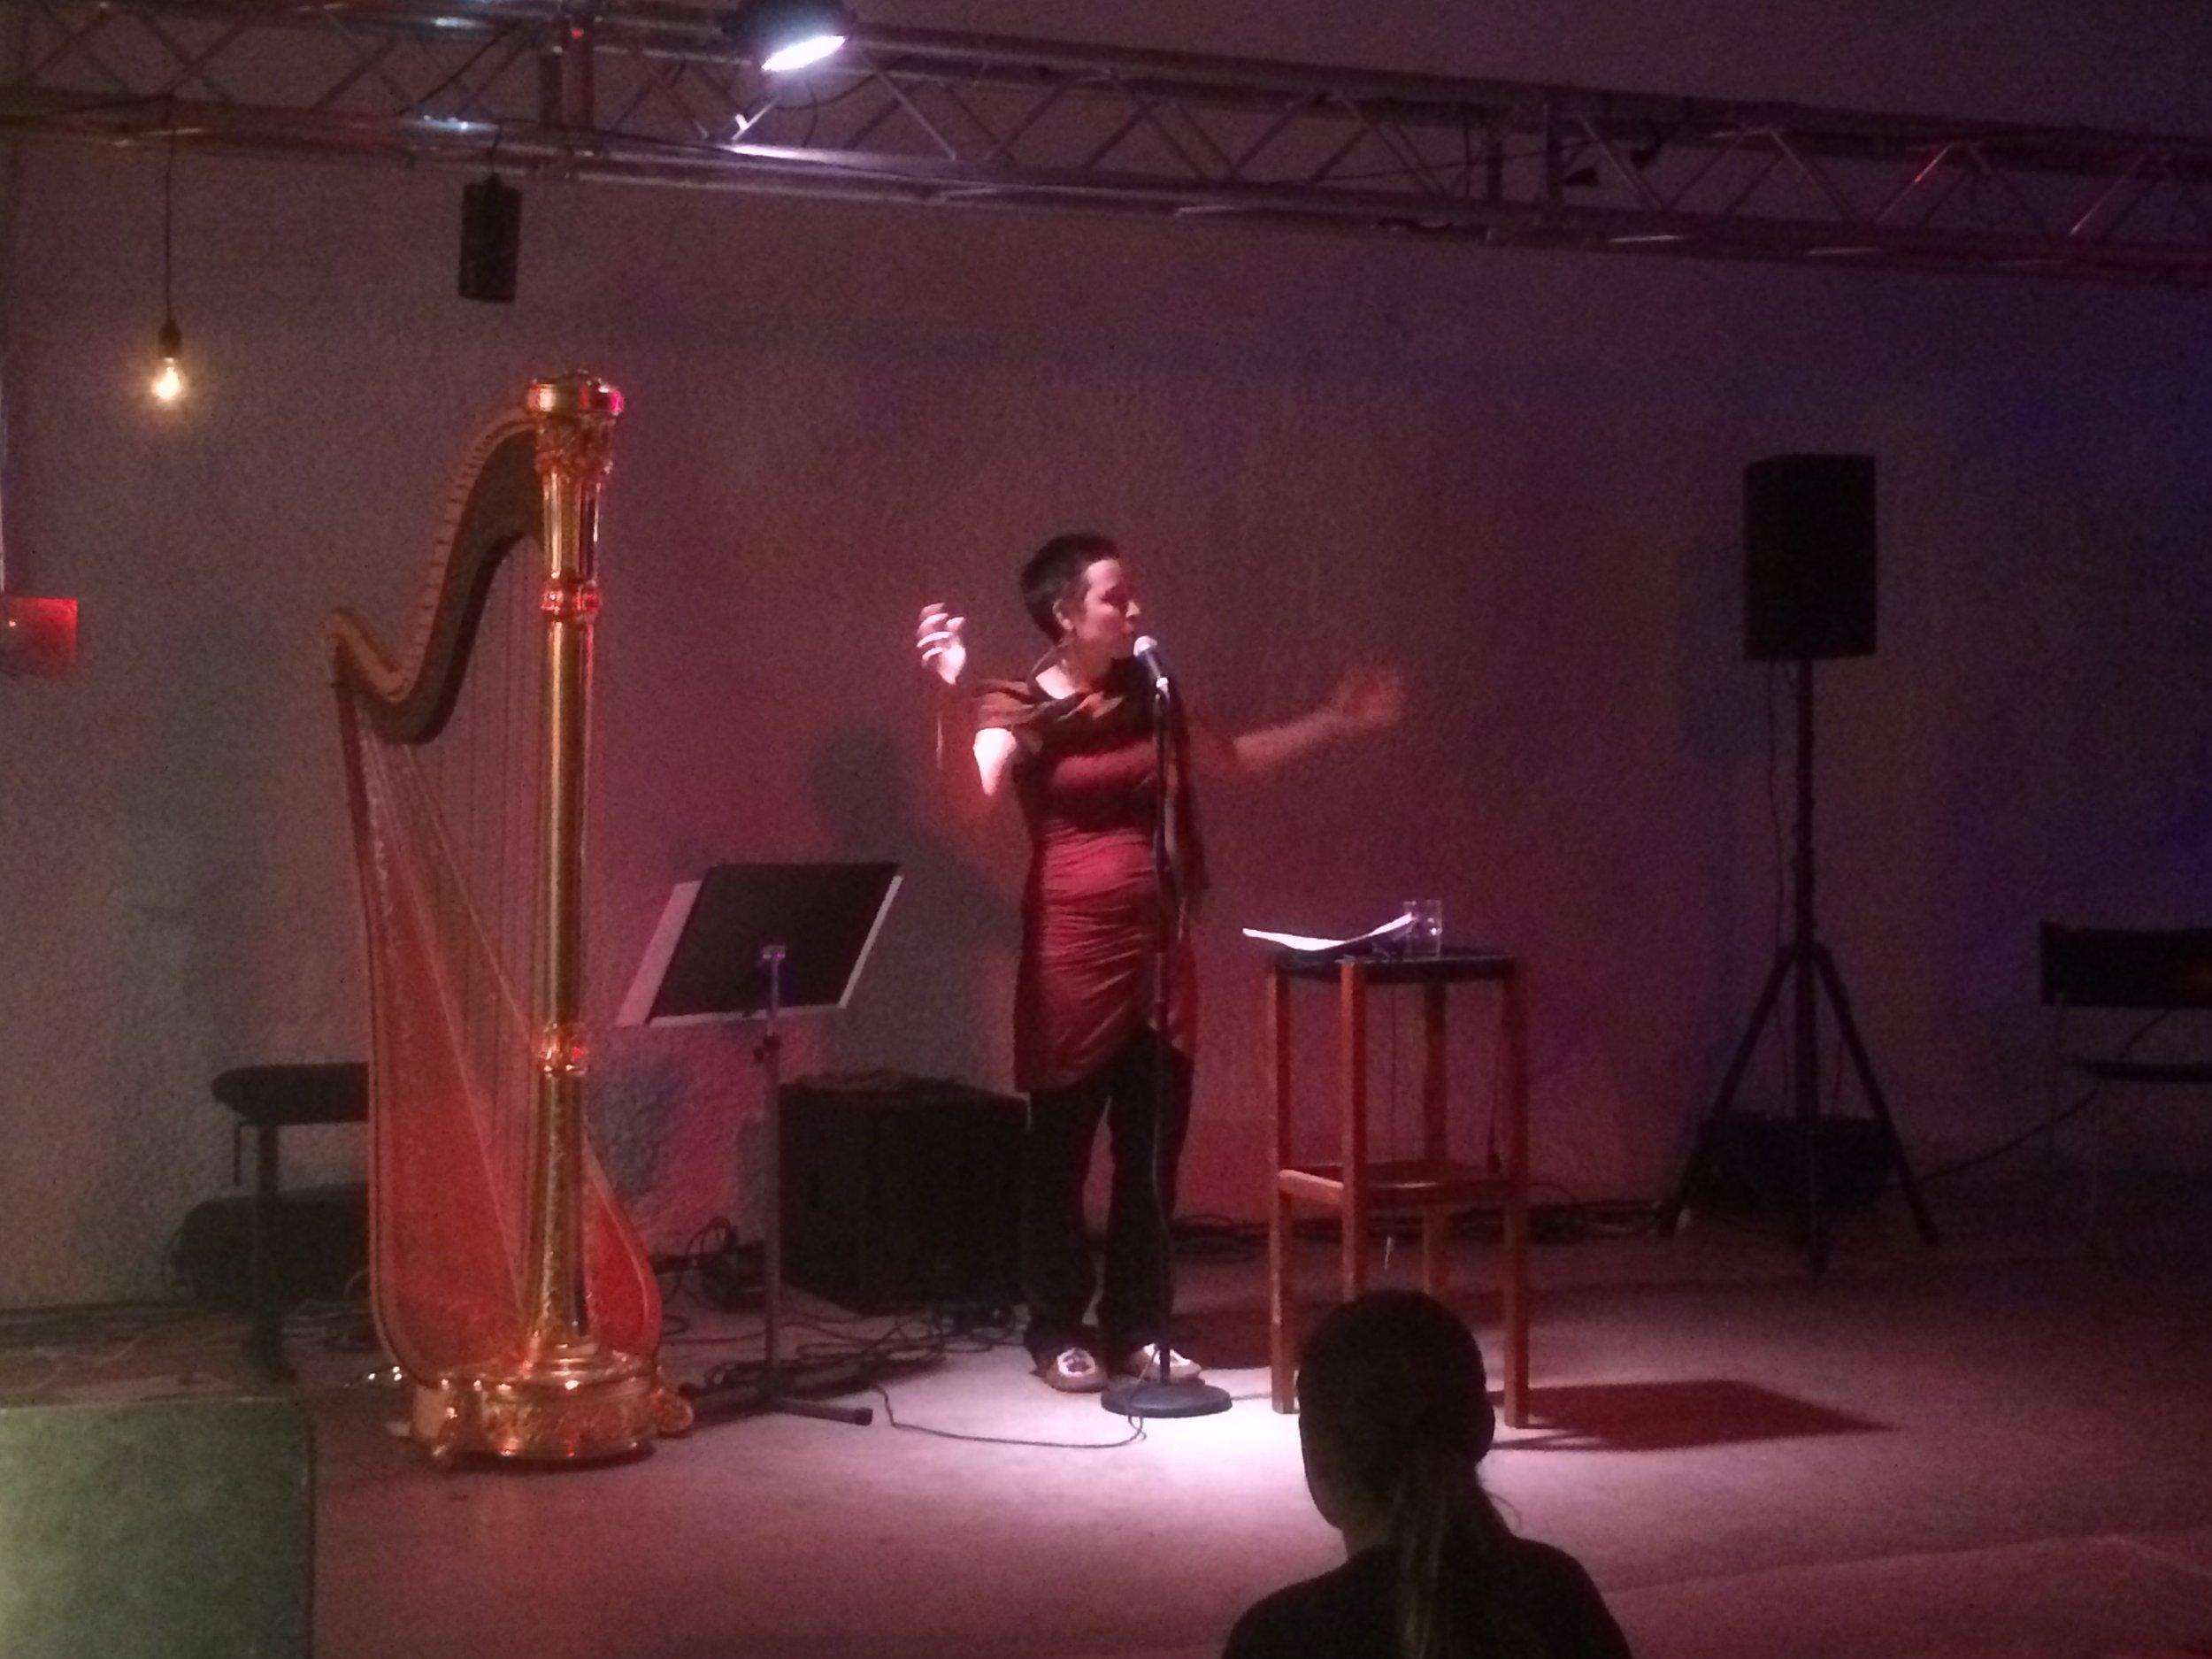 Helsinki - Small Sound performance - Carmen Braden Vapaan Taian Tilla 10.JPG